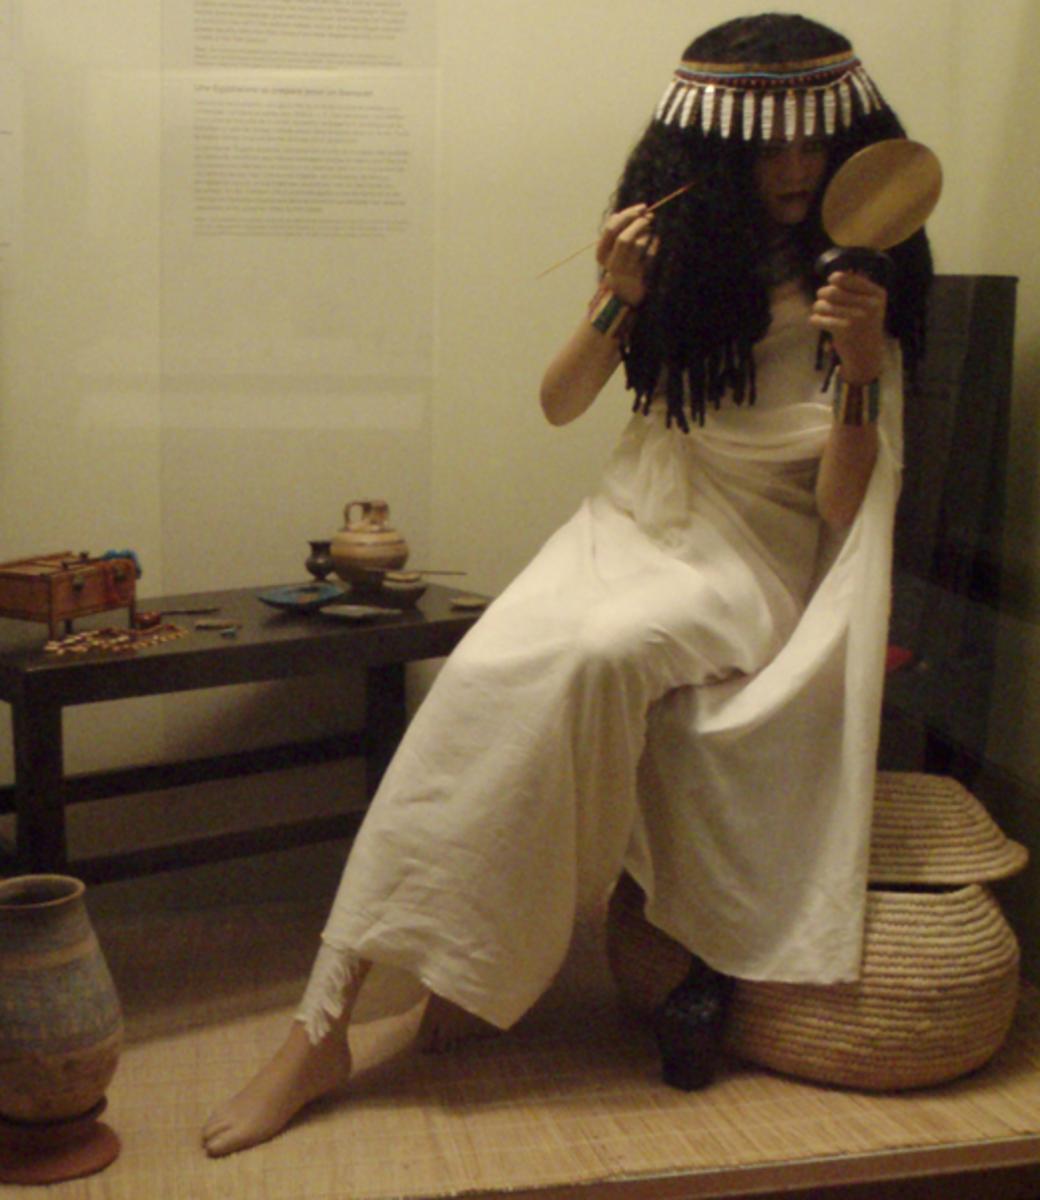 Display depicting an Ancient Egyptian woman (a manequin) applying makeup.